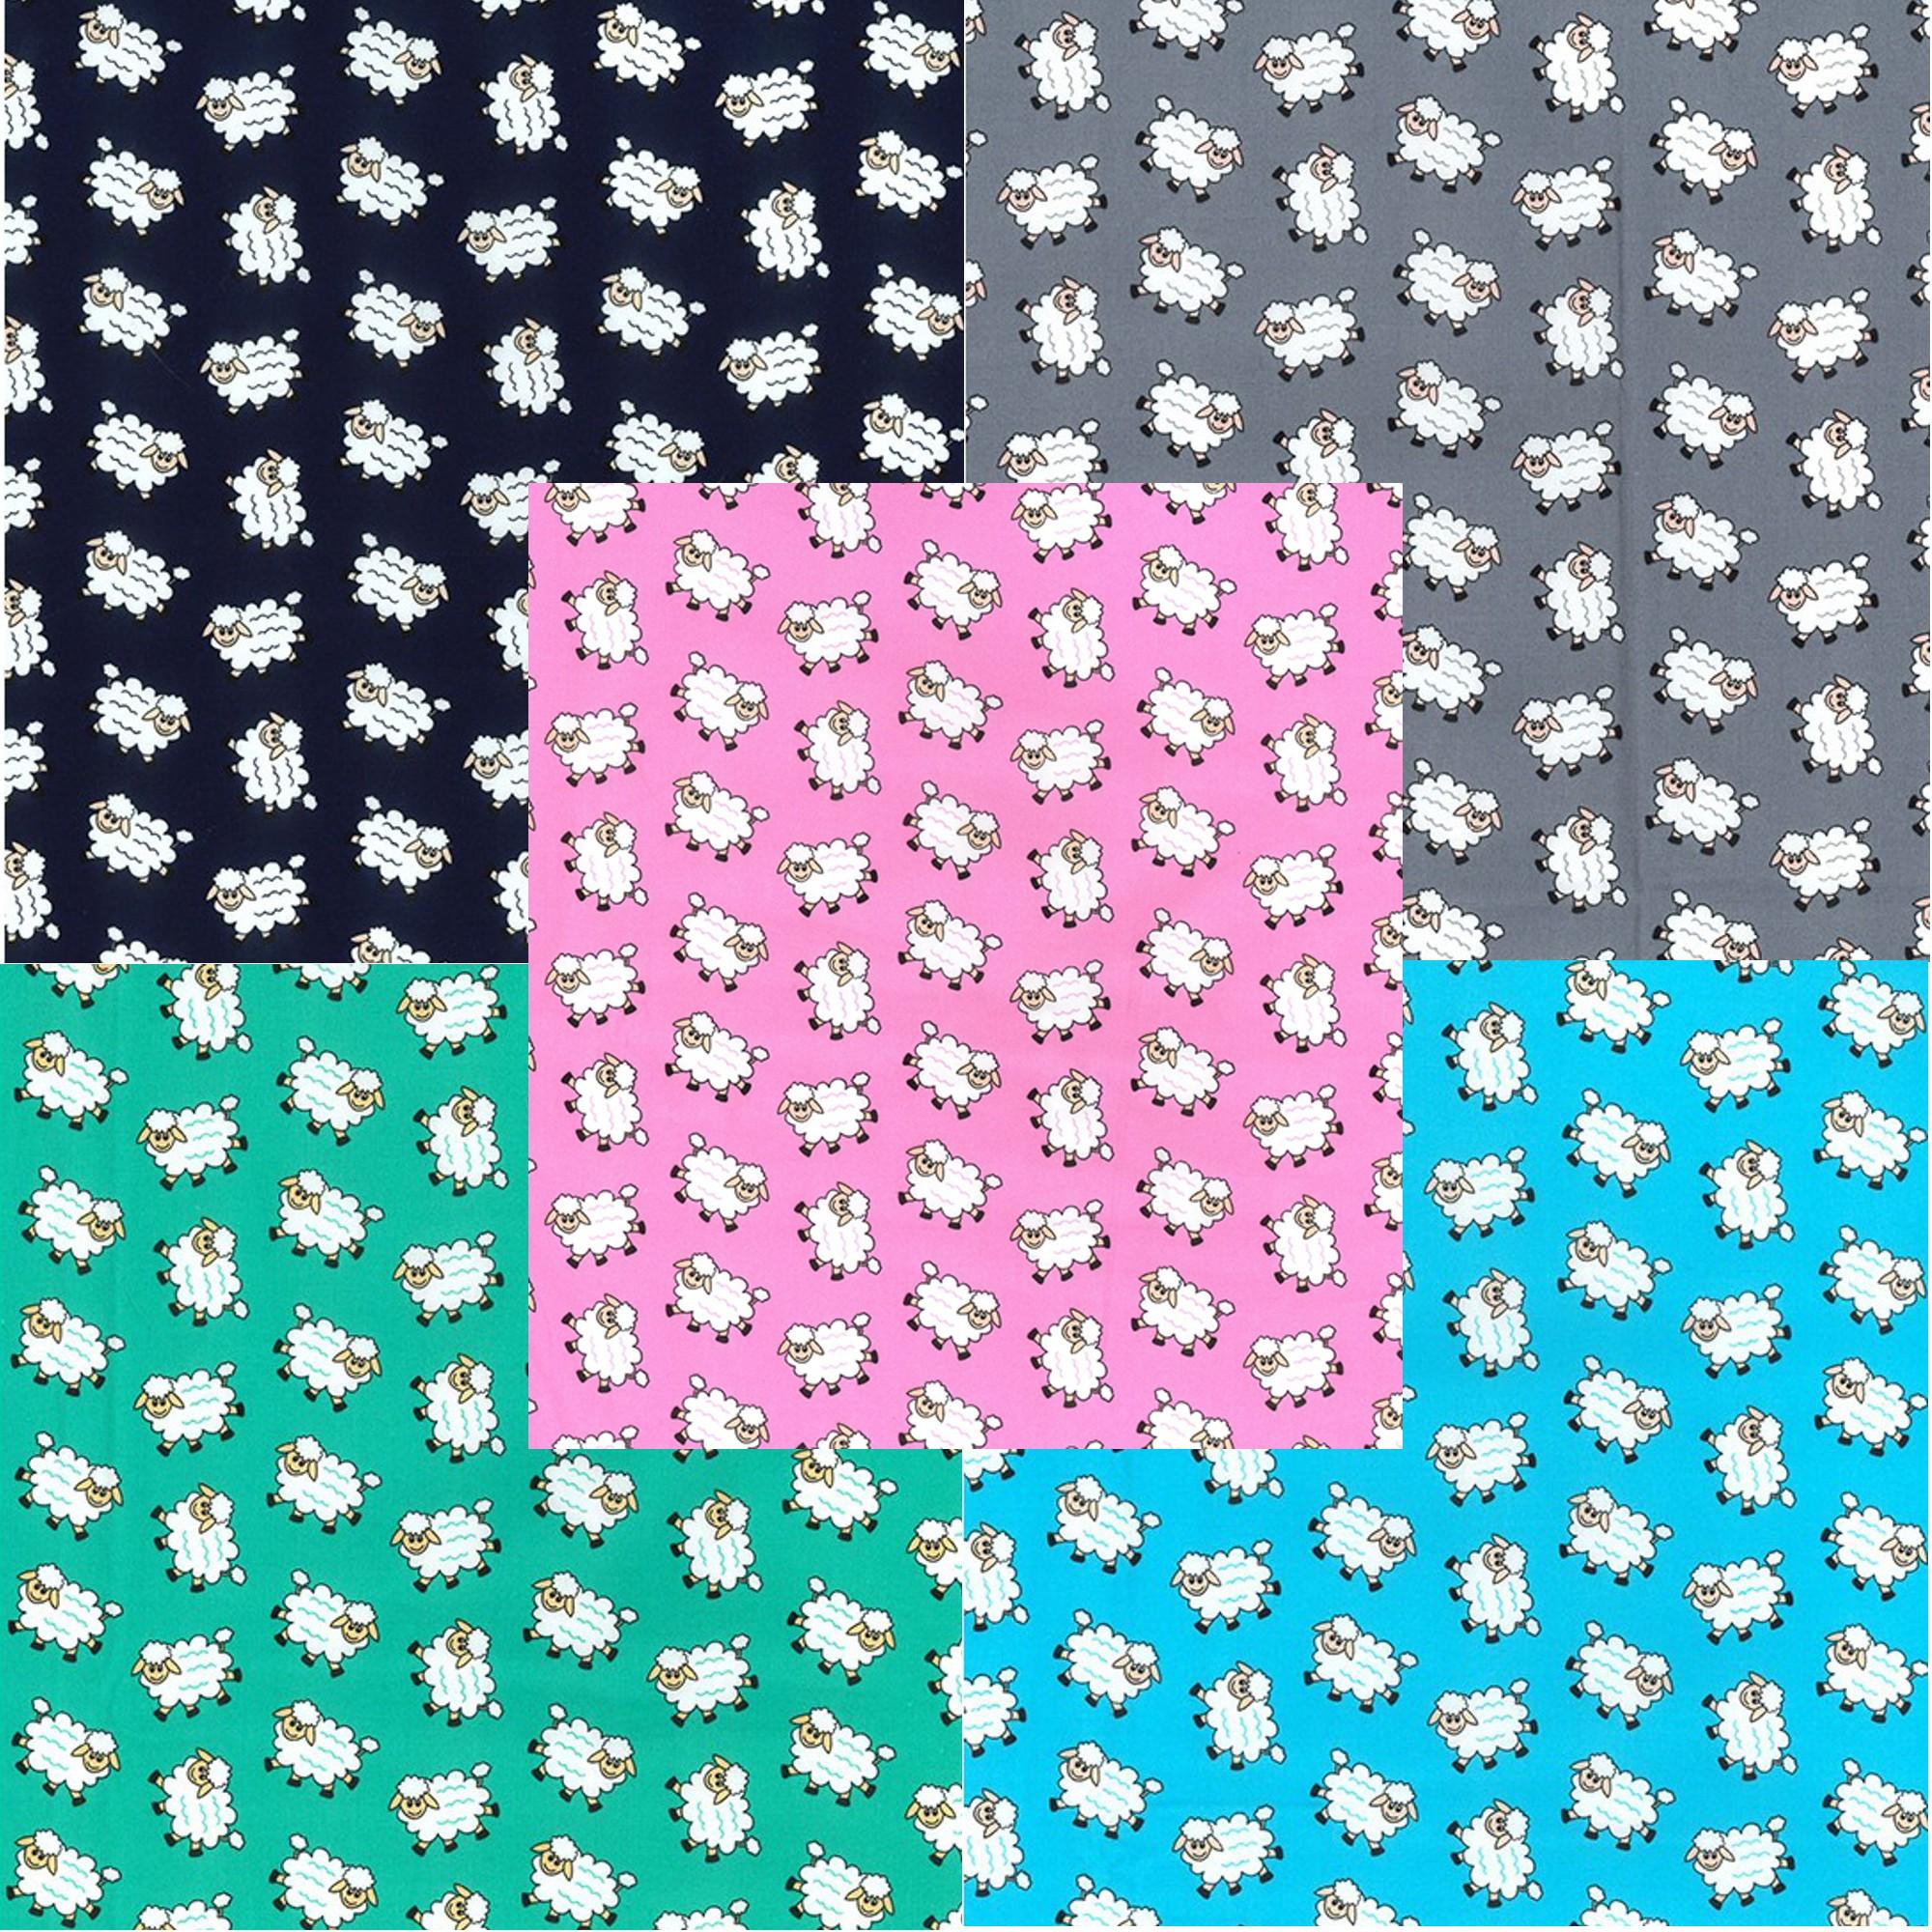 100% Cotton Poplin Fabric...